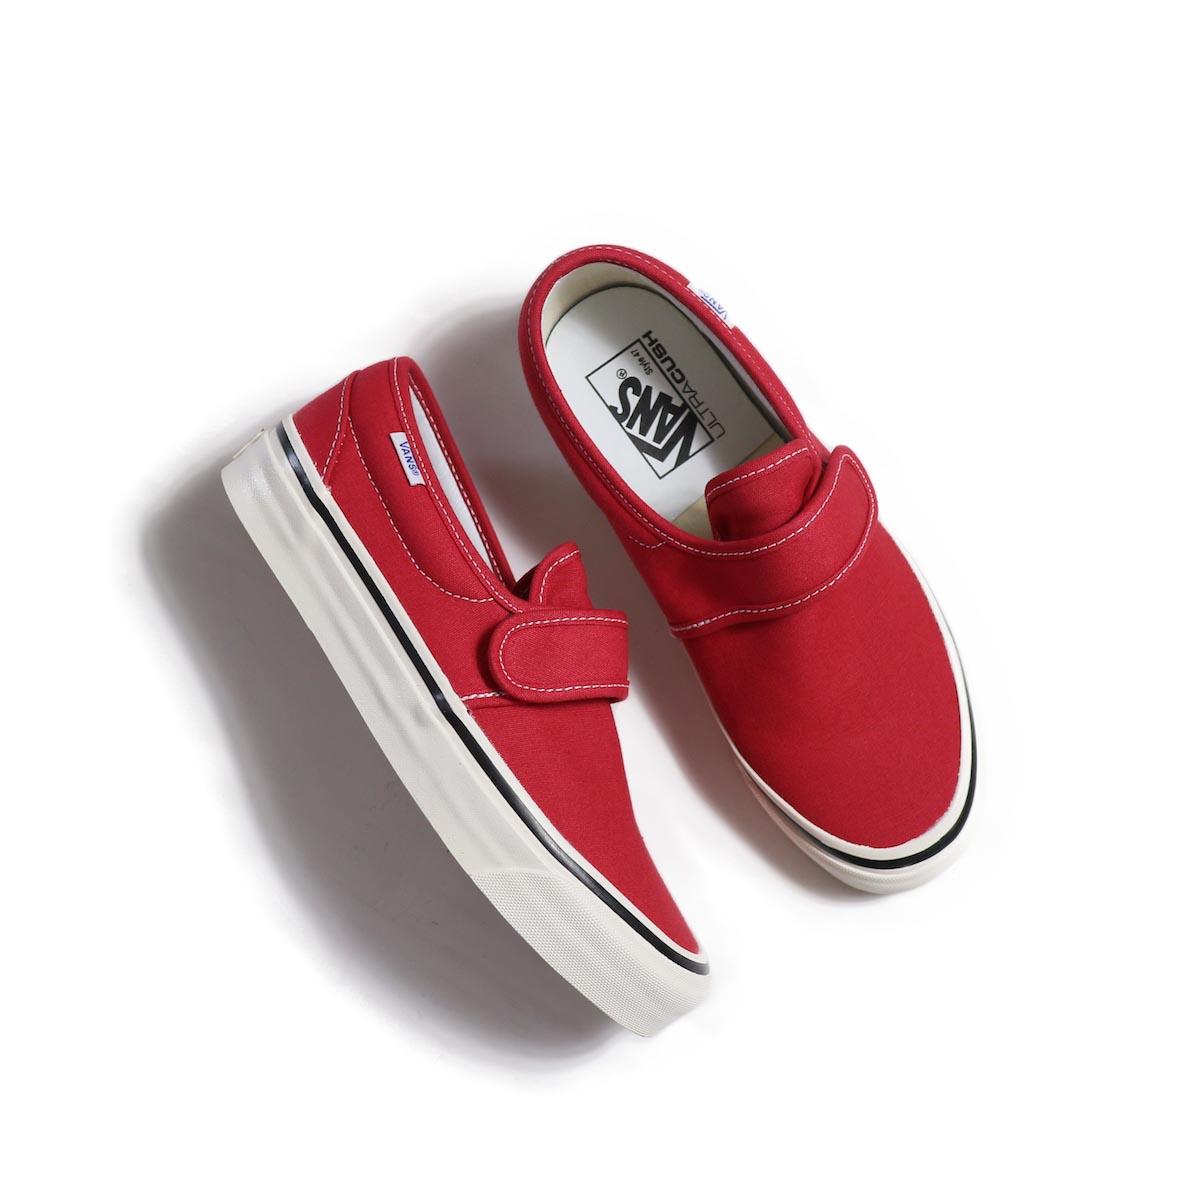 VANS / Slip-On 47 V DX (Anaheim Factory) -Red